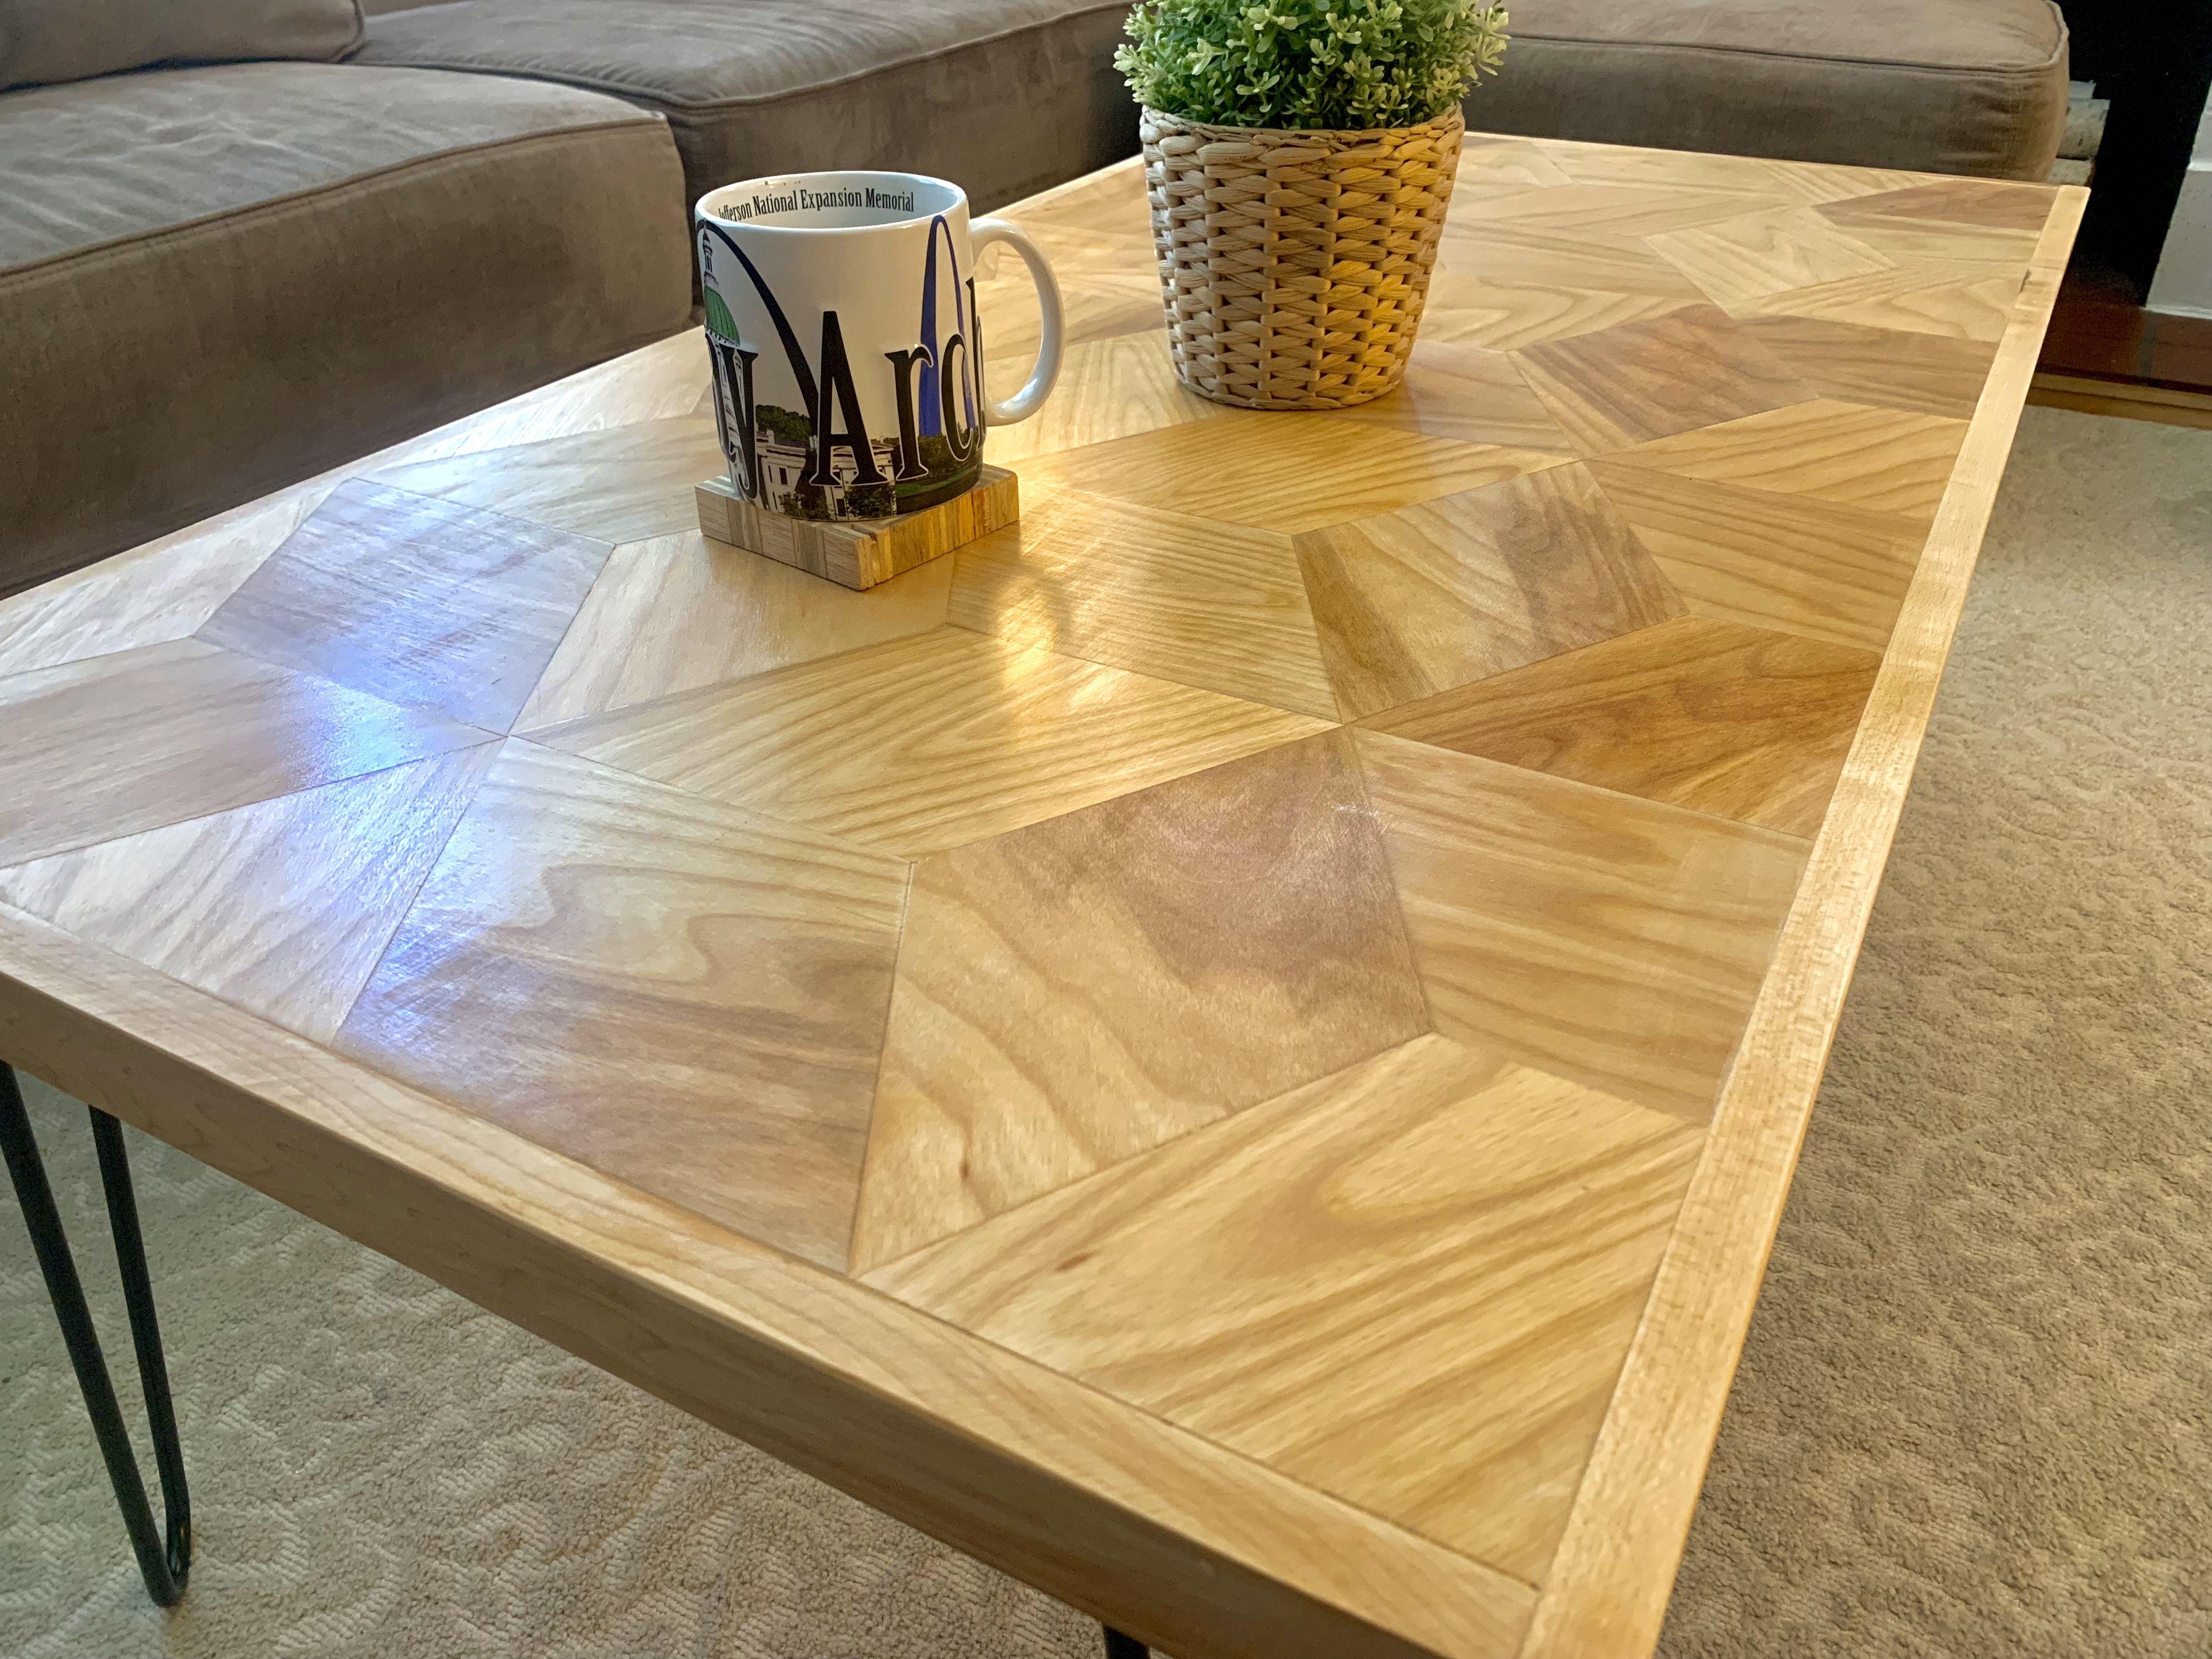 Diy Geometric Pattern Coffee Table Handmade Crafts Howto Diy Diy Table Legs Diy Coffee Table Pallet Coffee Table Diy [ 3024 x 4032 Pixel ]